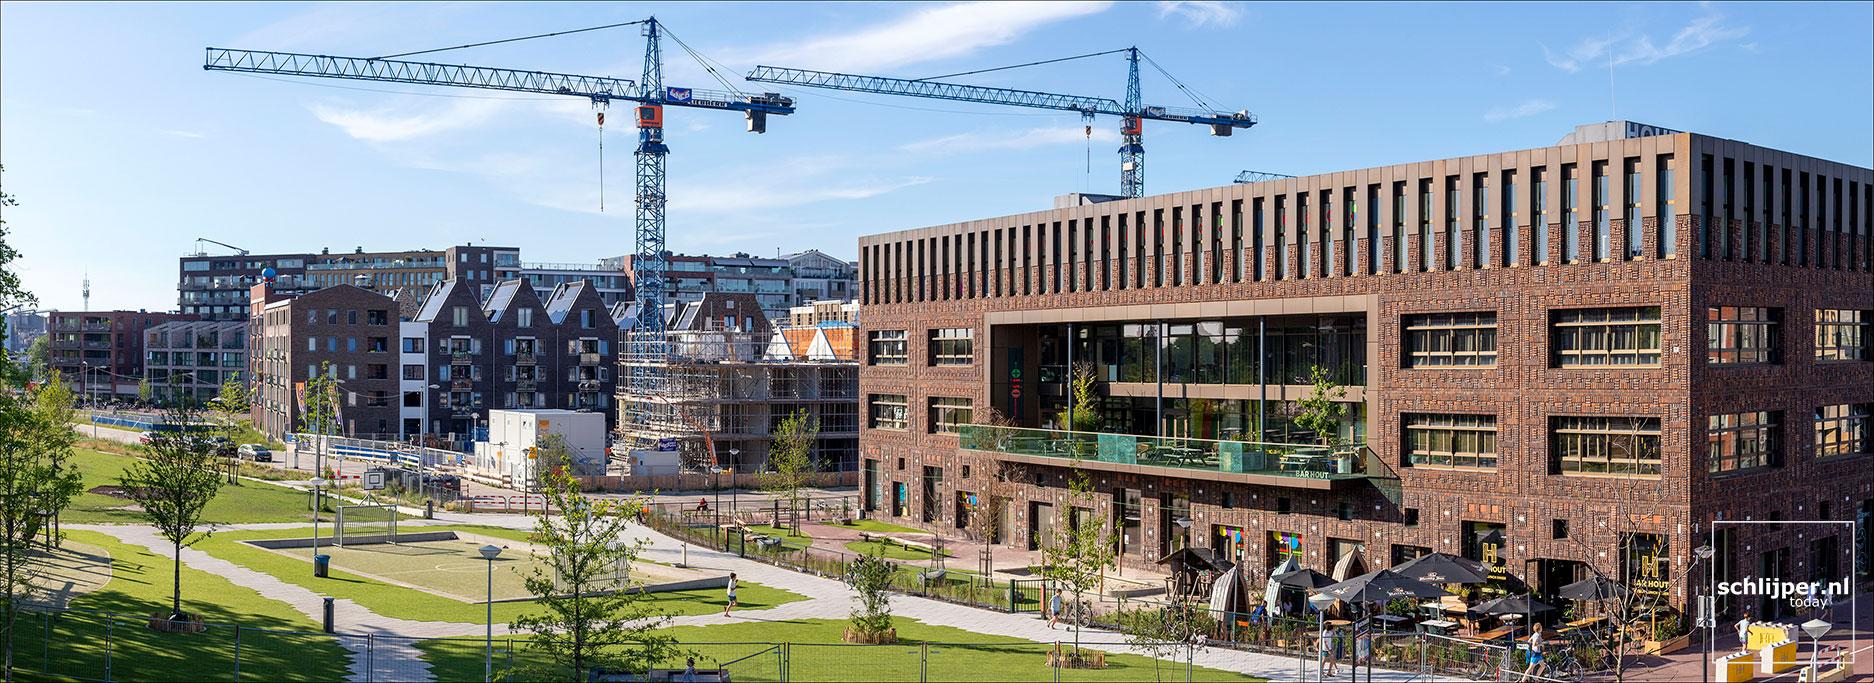 Nederland, Amsterdam, 24 juni 2020